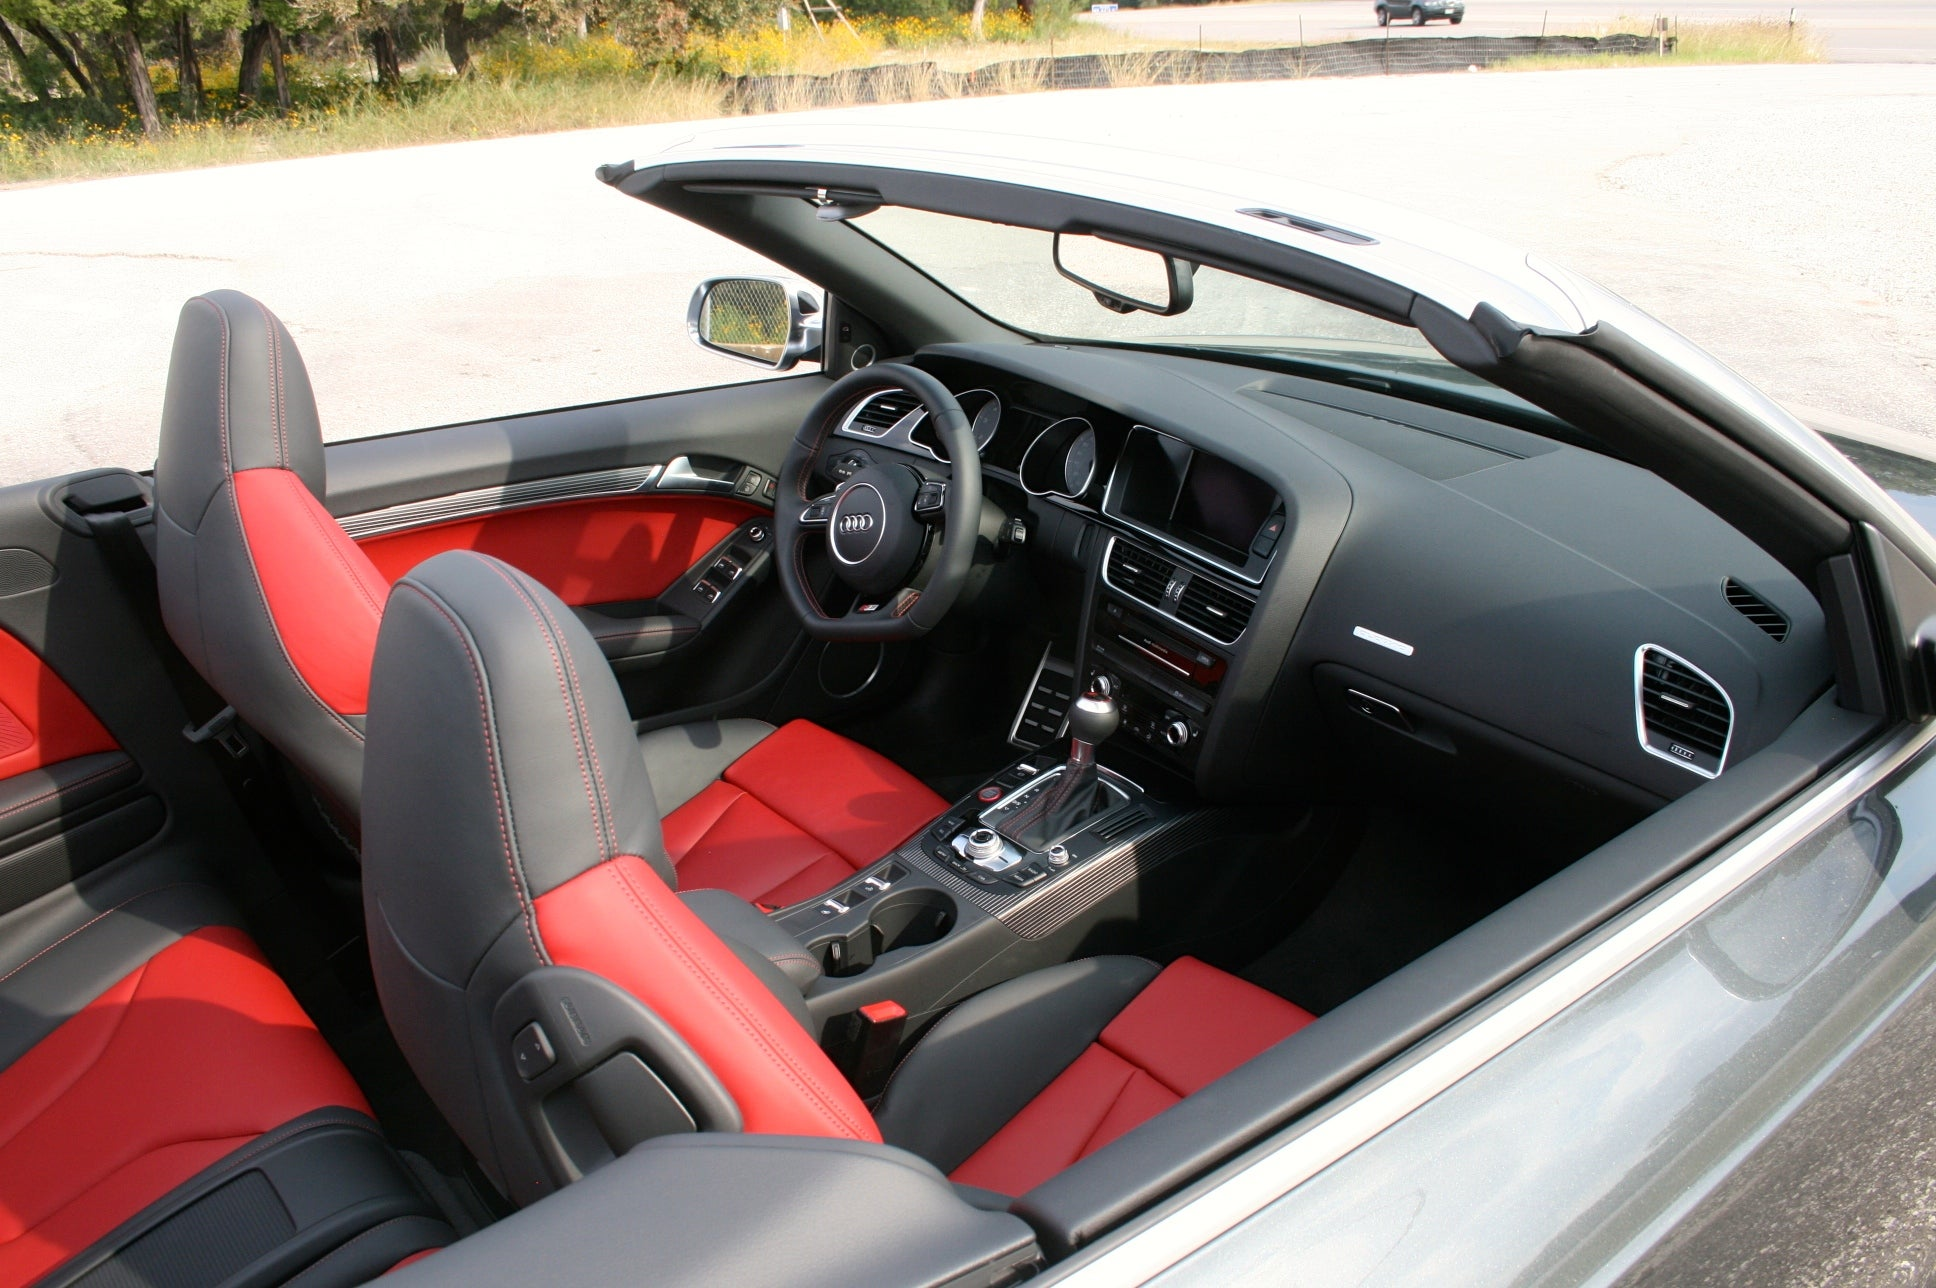 2015 audi s5 cabriolet the jalopnik review rh jalopnik com audi s5 cabriolet manual transmission Blue Audi S5 Convertible